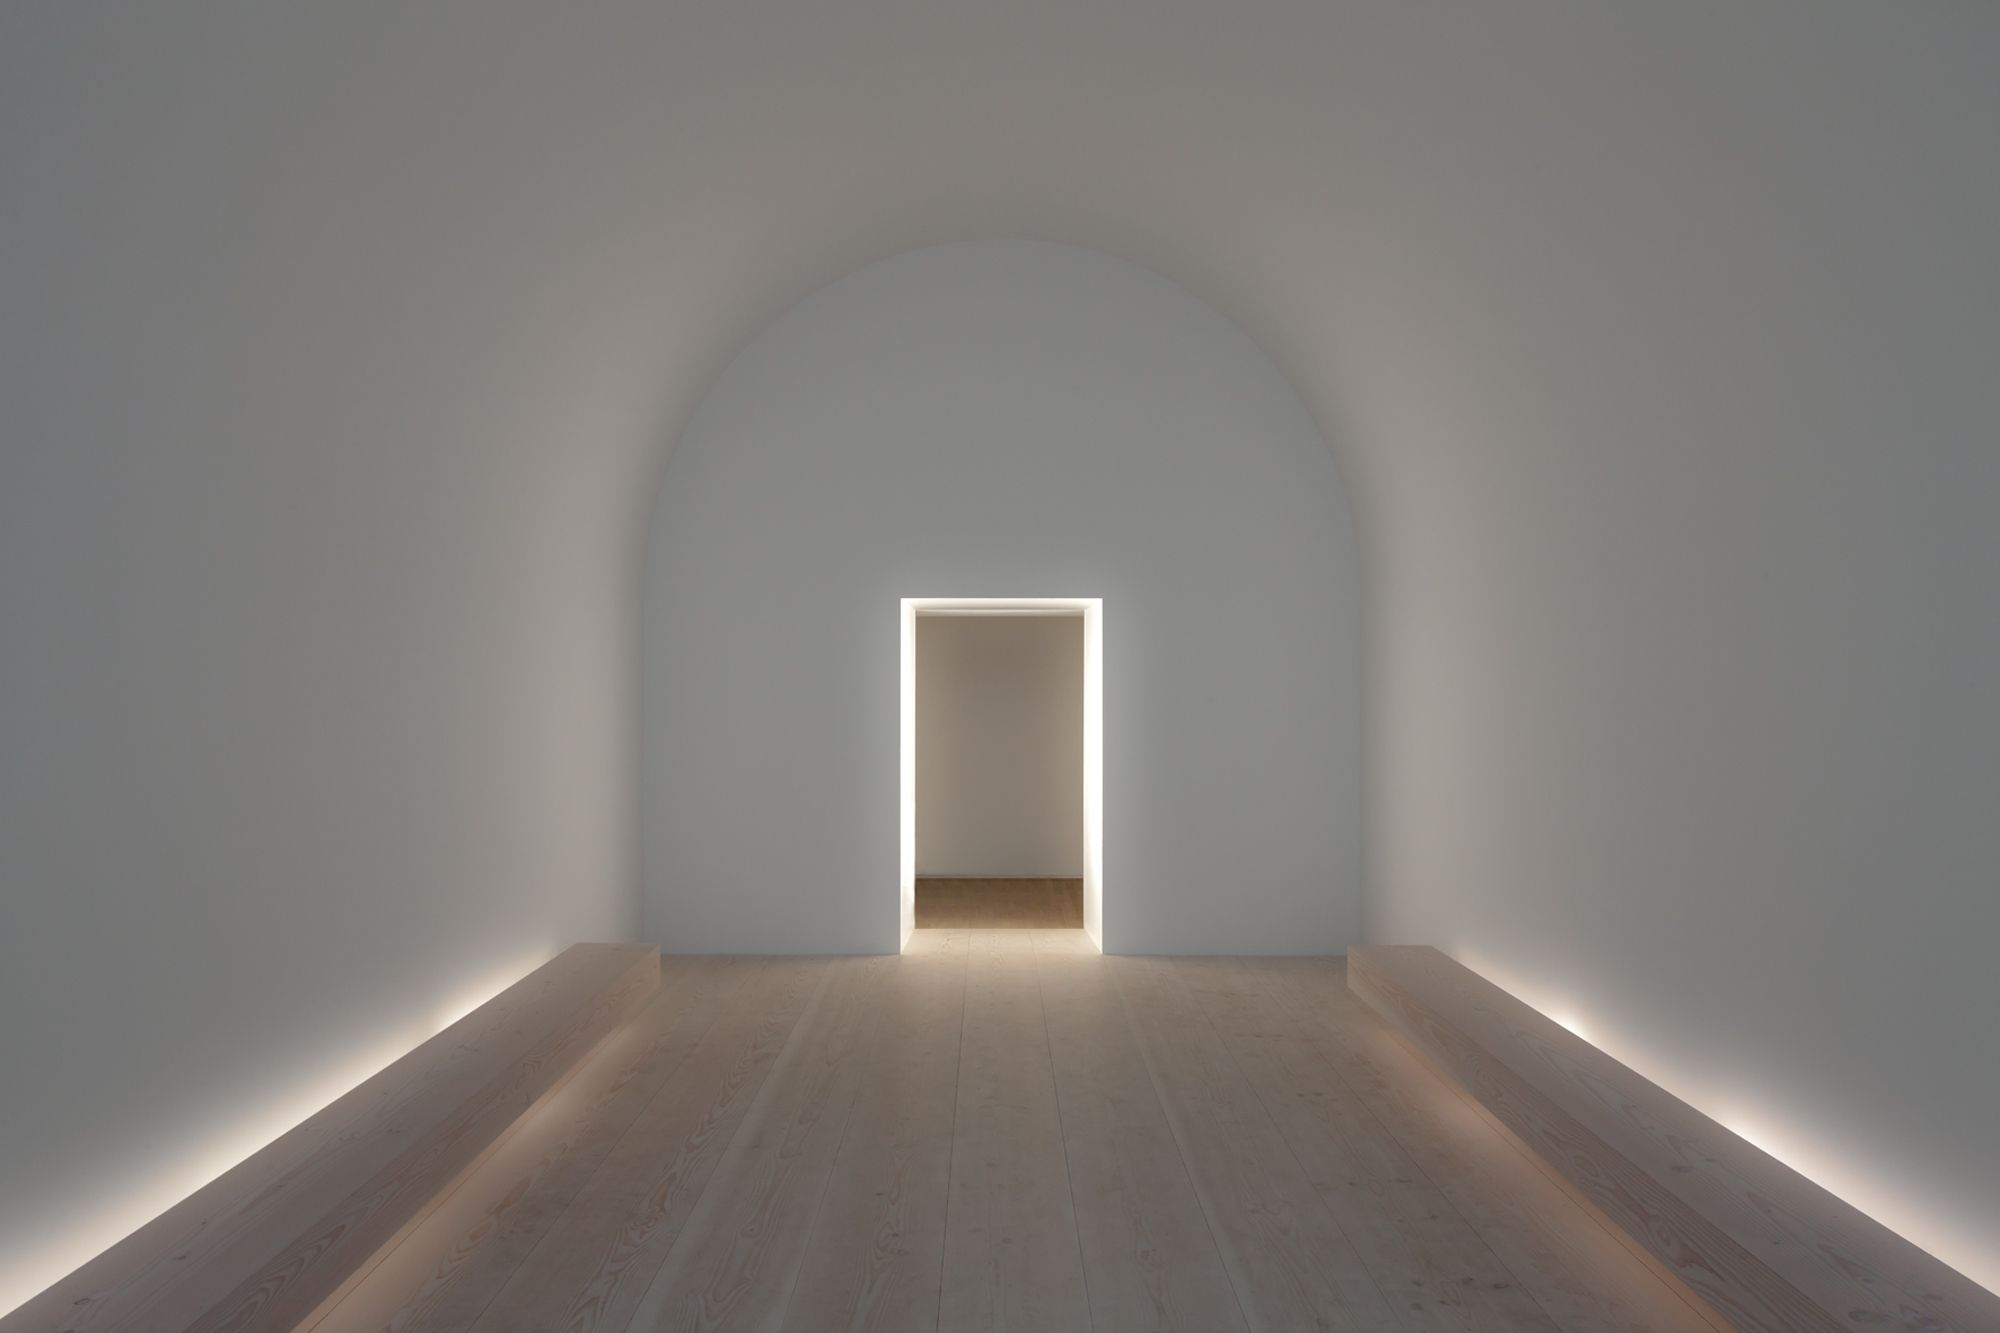 John pawson plain space exhibition interiors design museum